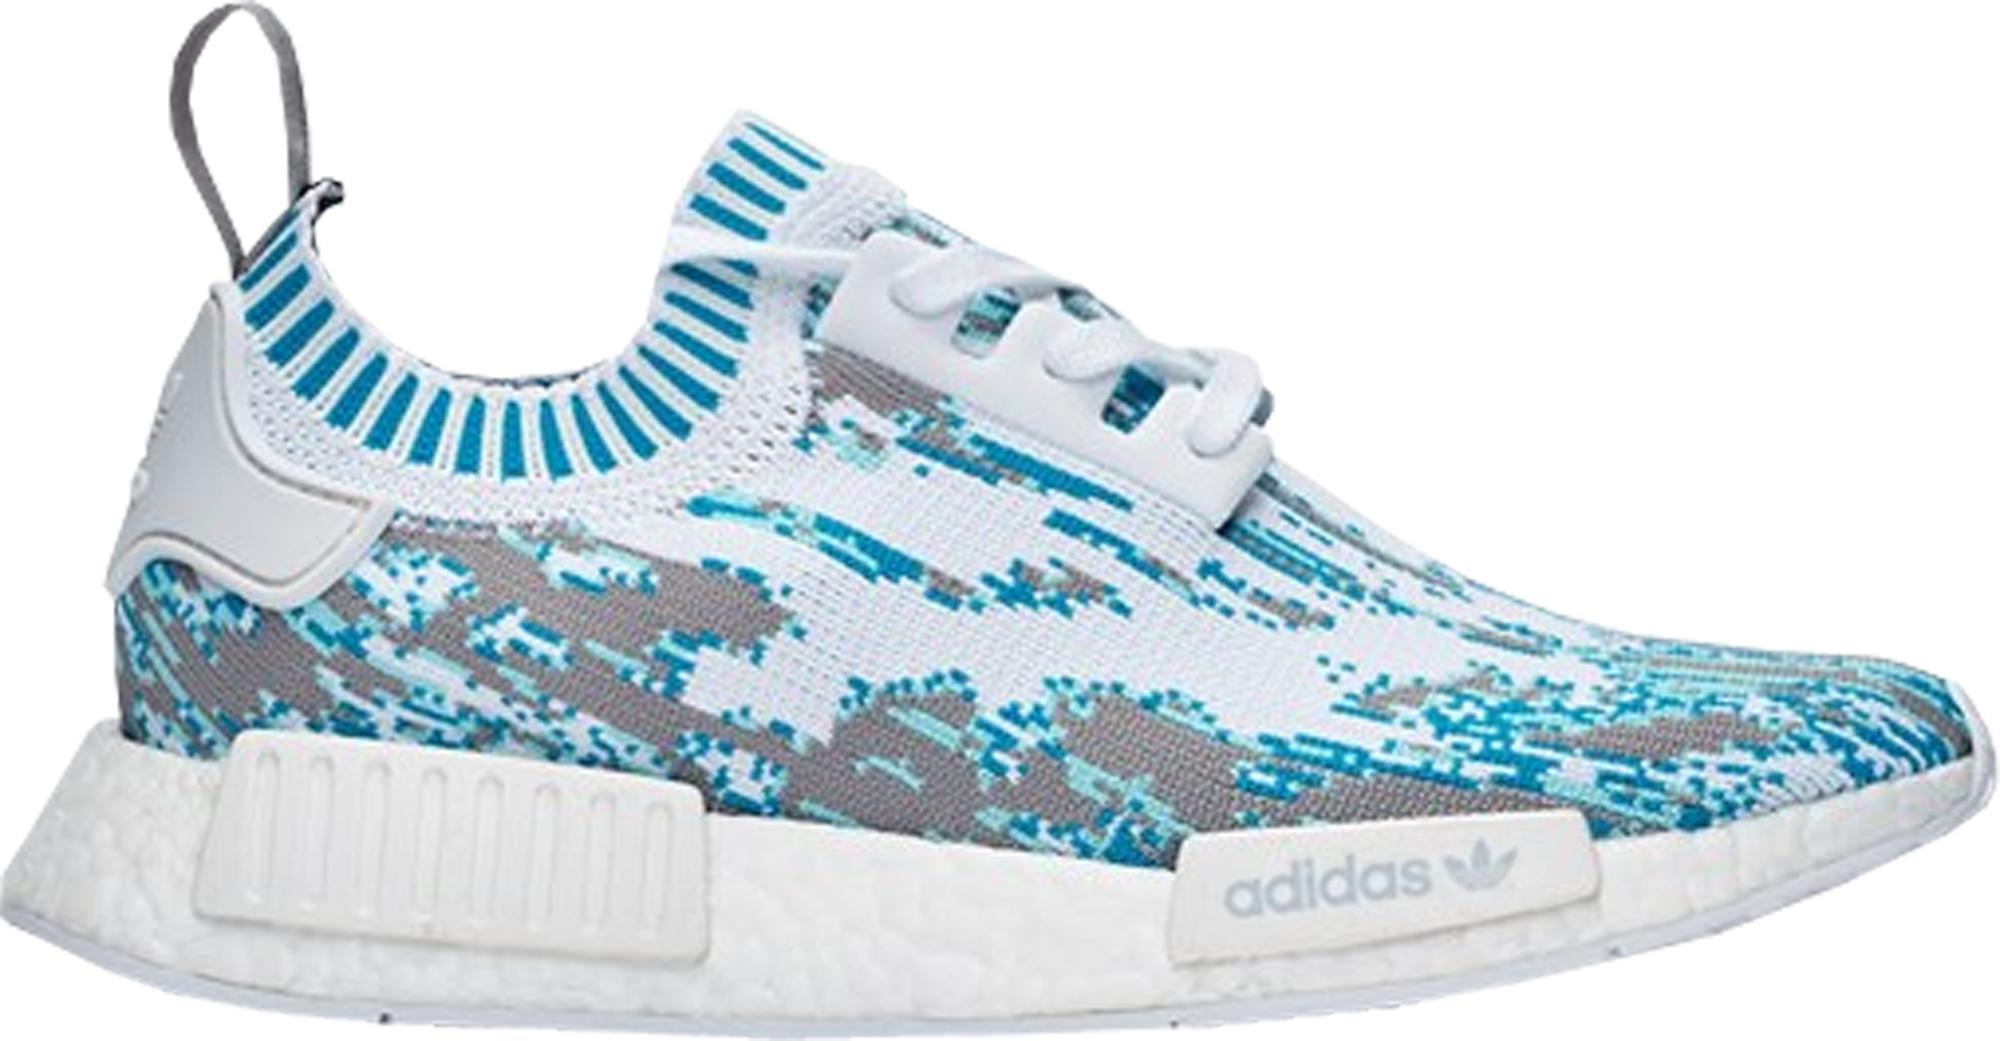 adidas NMD R1 Sneakersnstuff Datamosh Clear Aqua